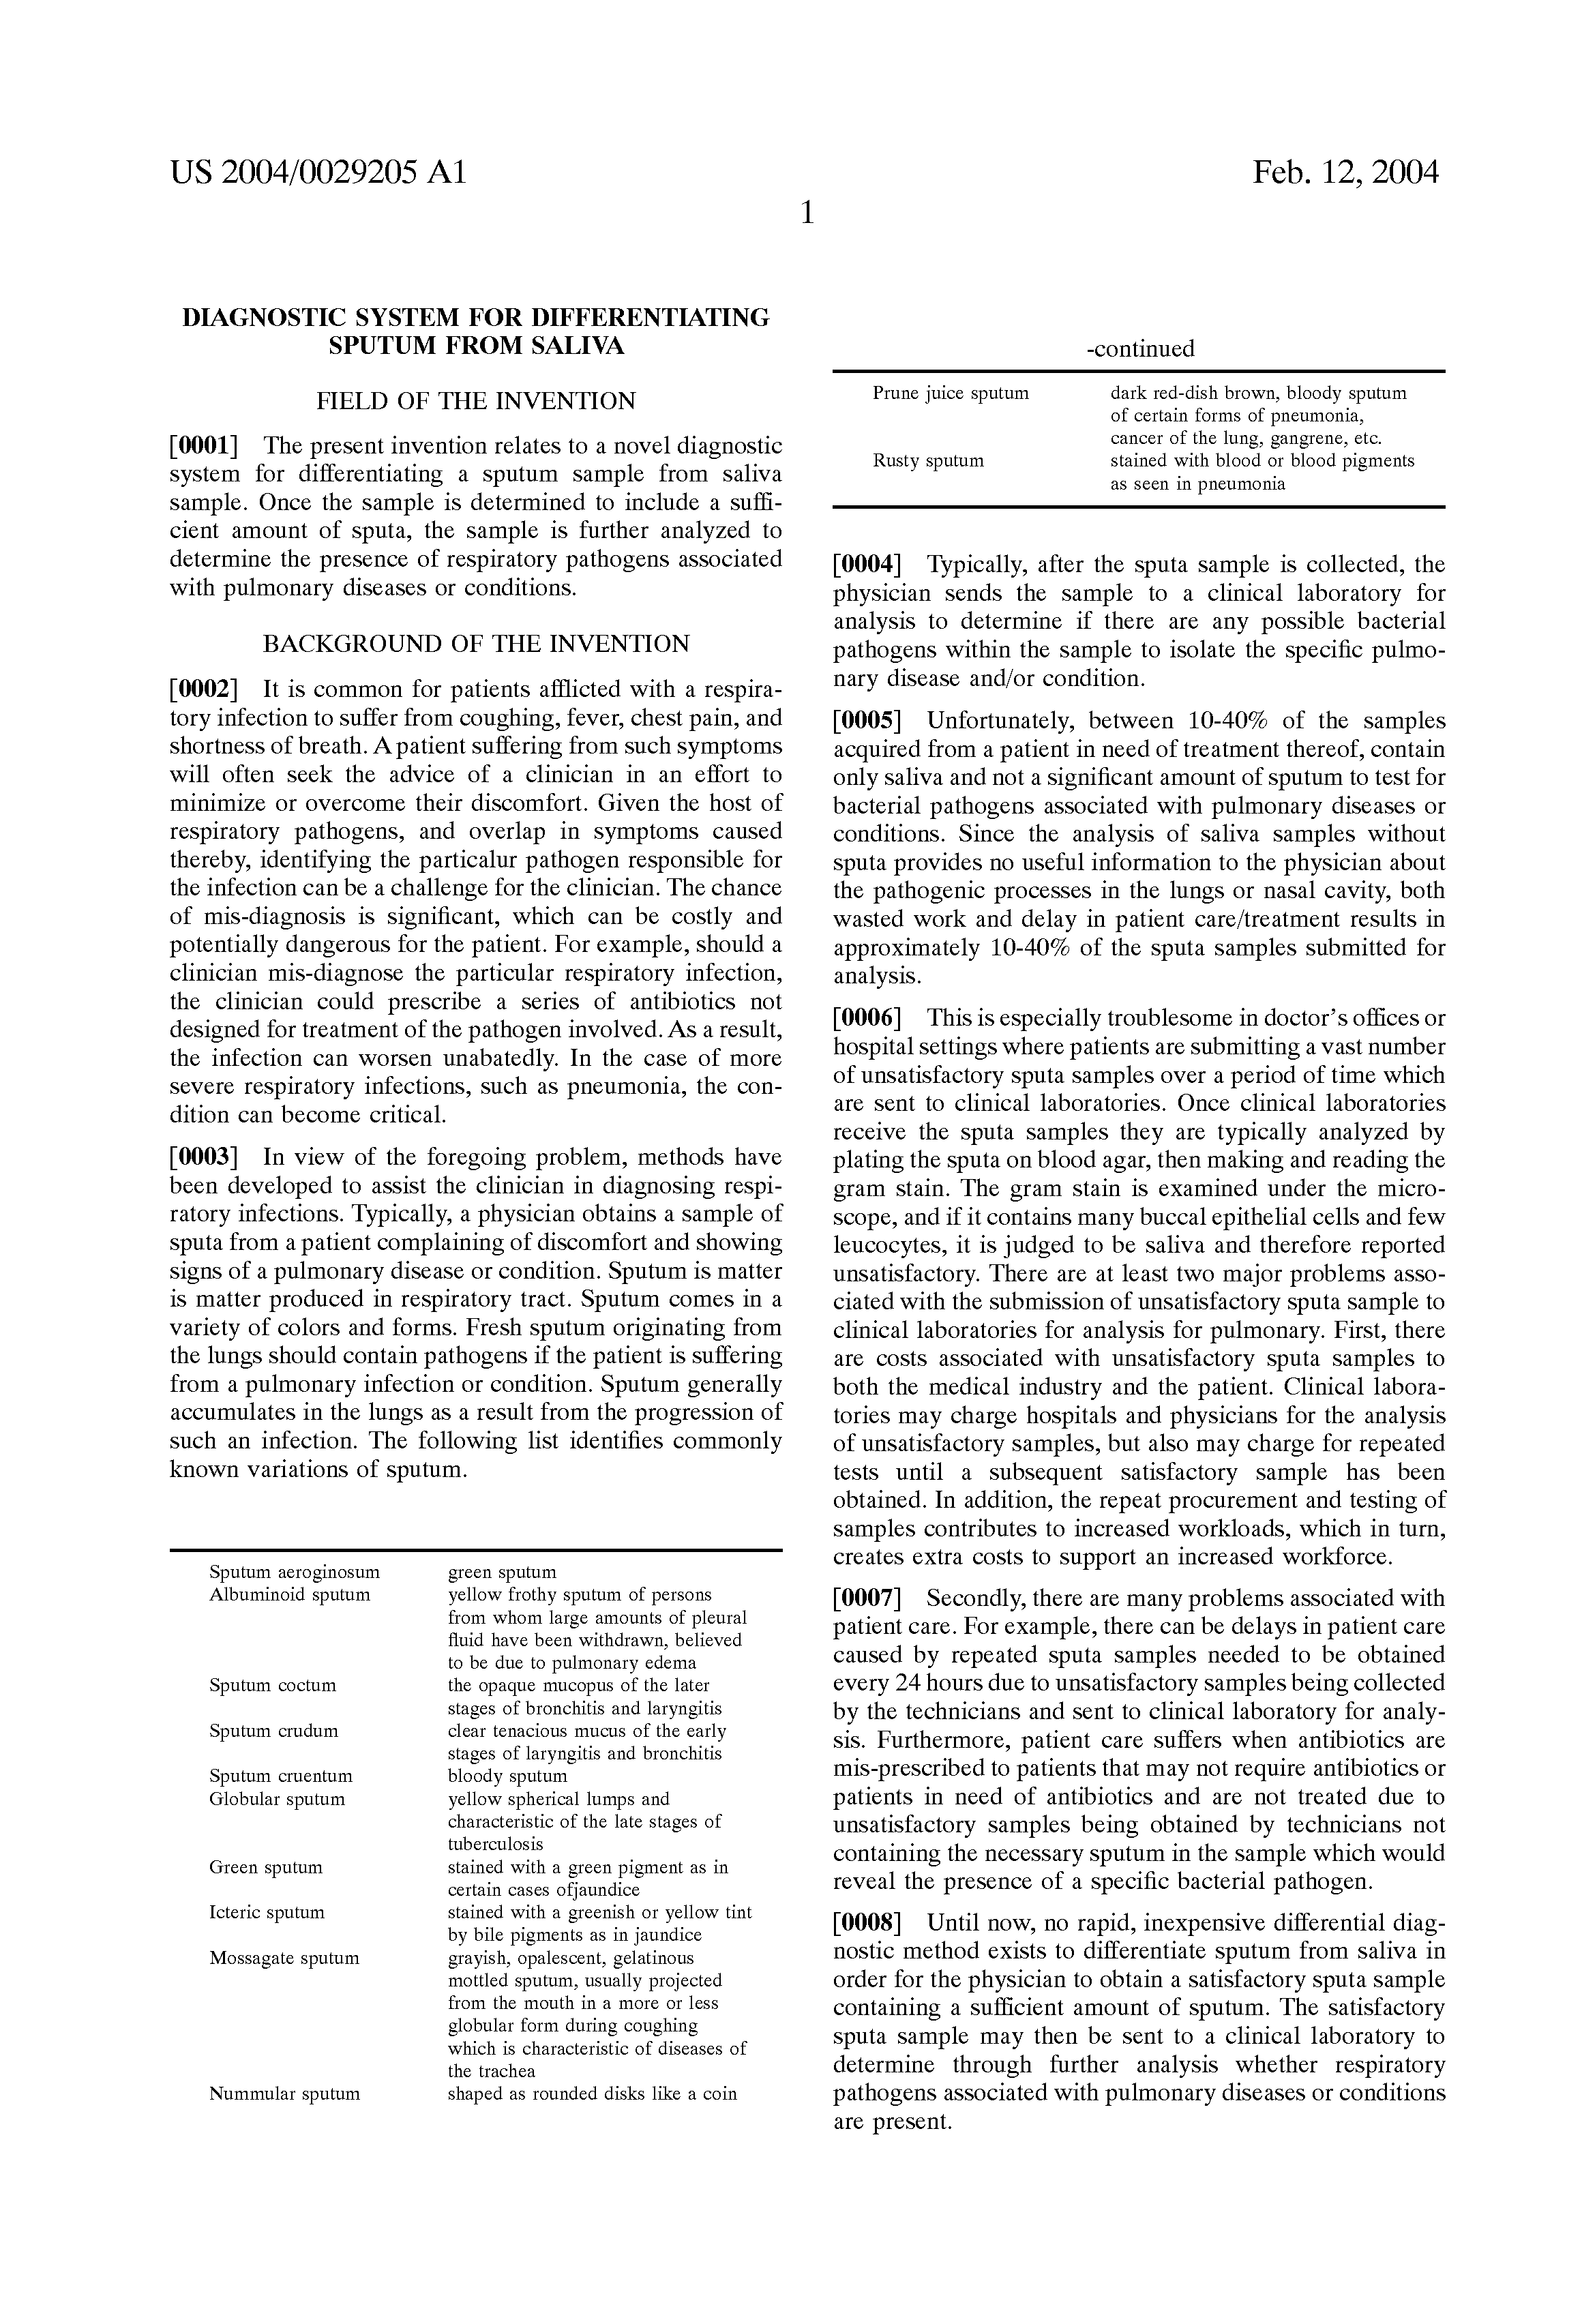 multistix 10 sg instructions